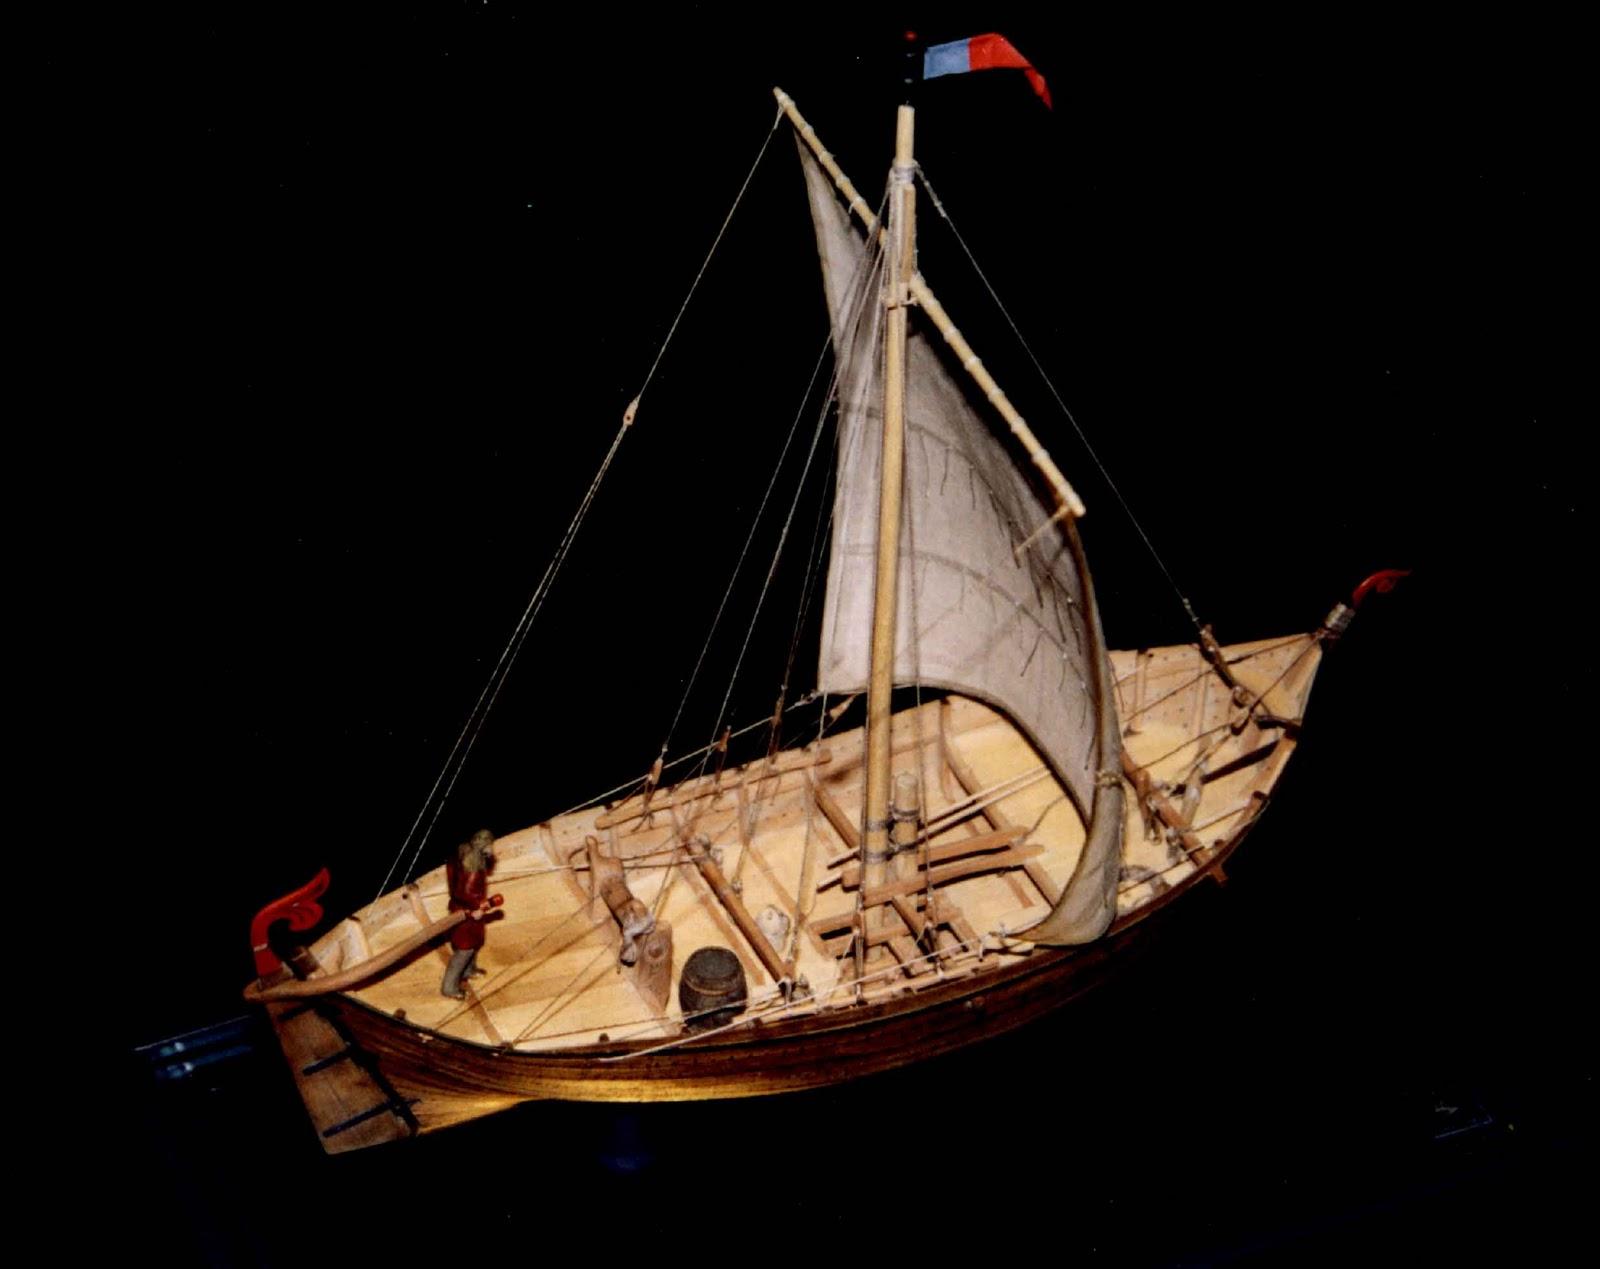 http://3.bp.blogspot.com/-LjIcRUUXYsI/TvEZBiqDDUI/AAAAAAAAKek/yzeb8RNh-so/s1600/fide+boat+papercraft.jpg